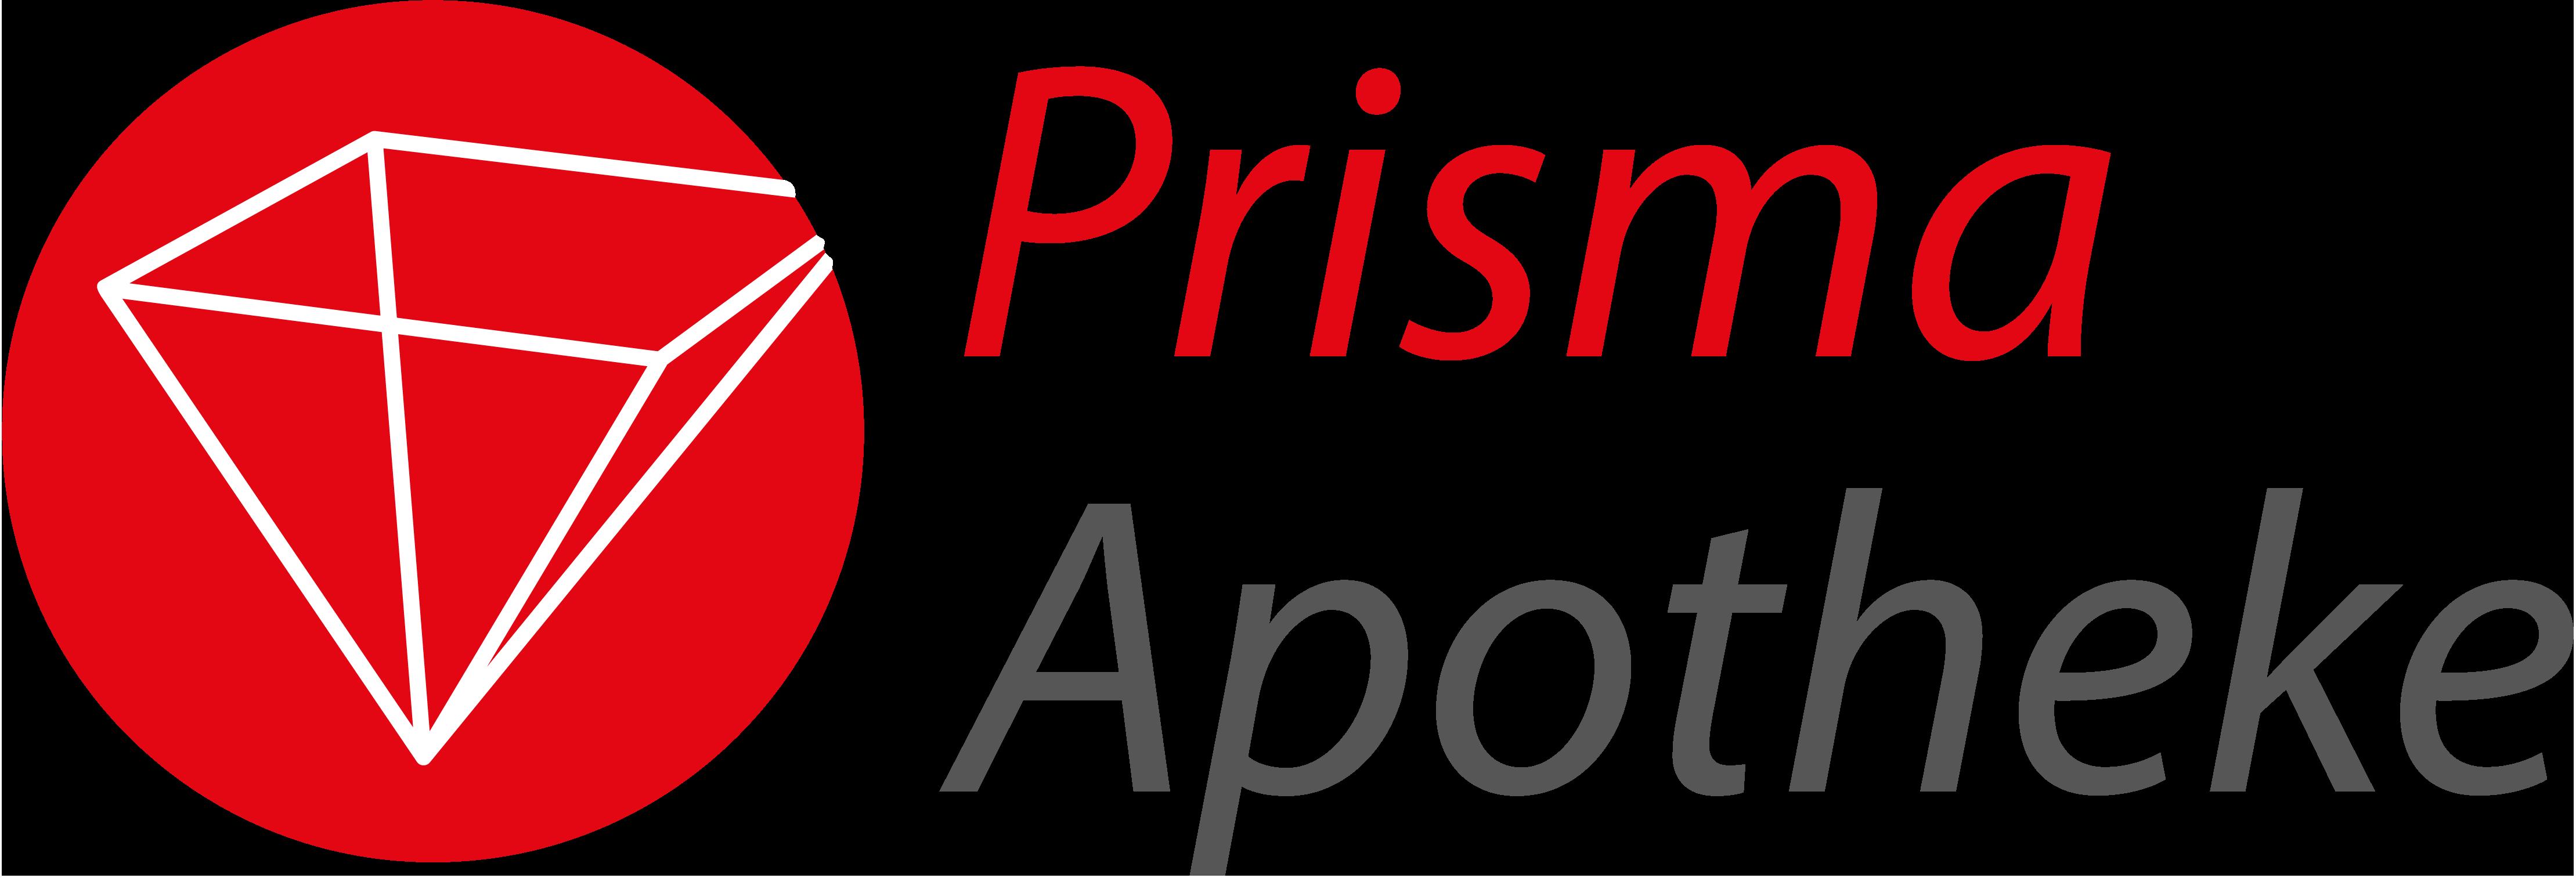 Logo der Prisma Apotheke